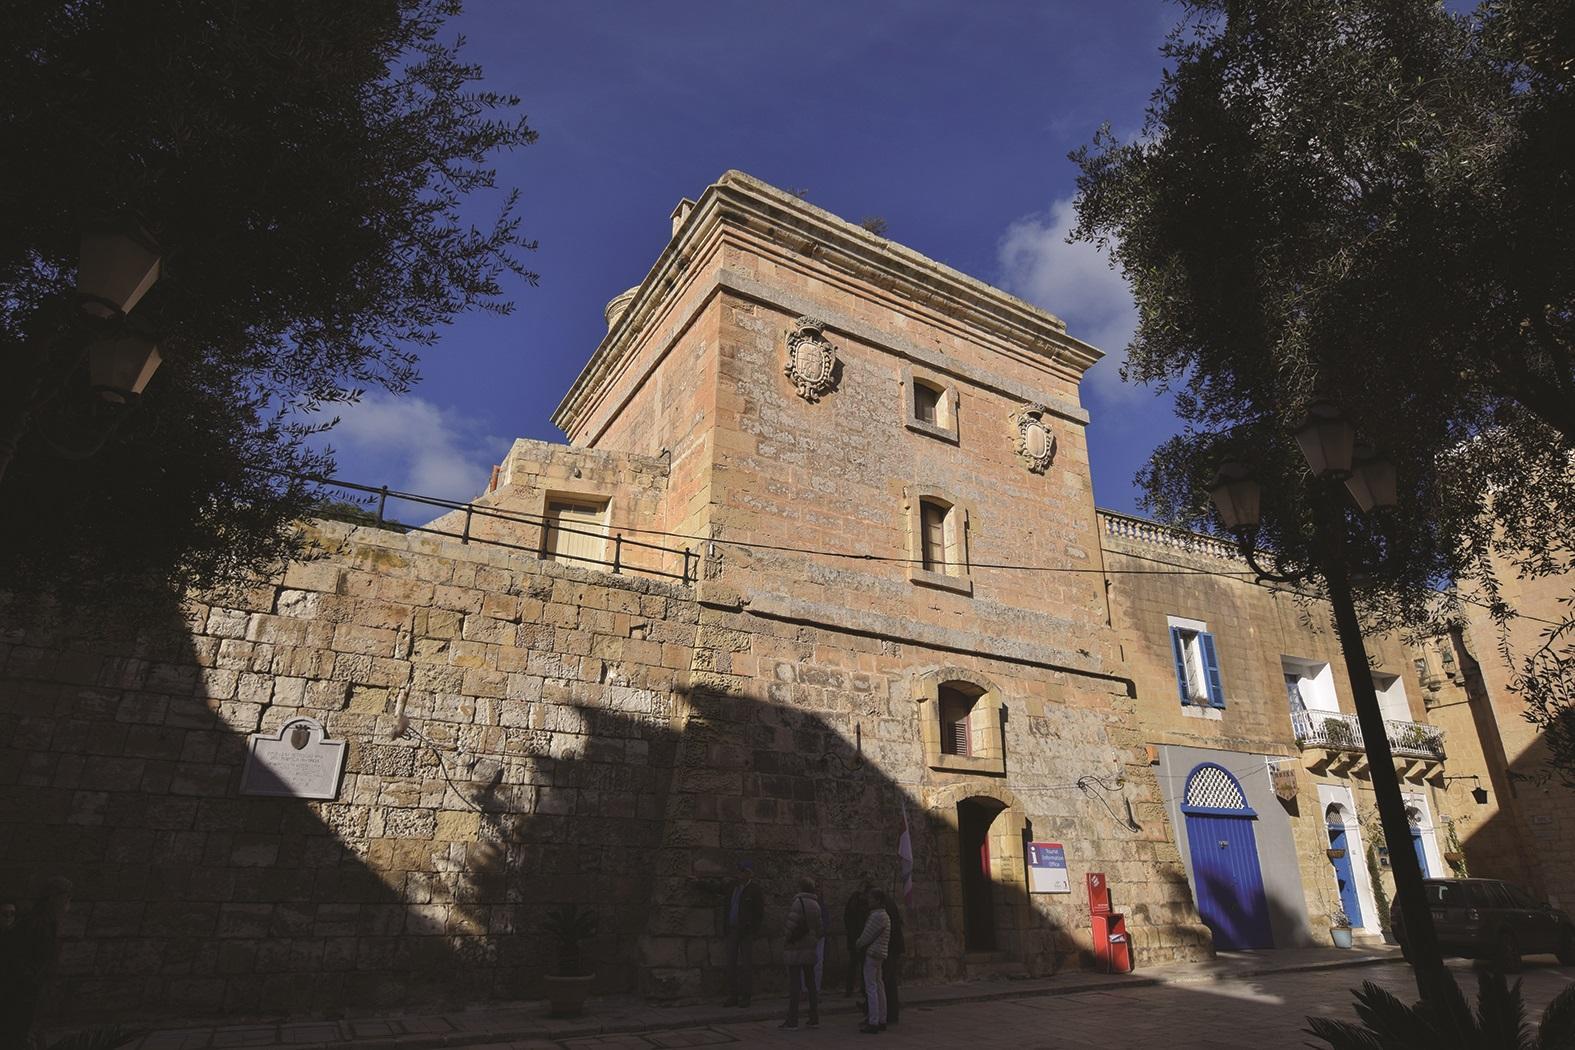 The Torre dello Standardo or Tower of the Standard